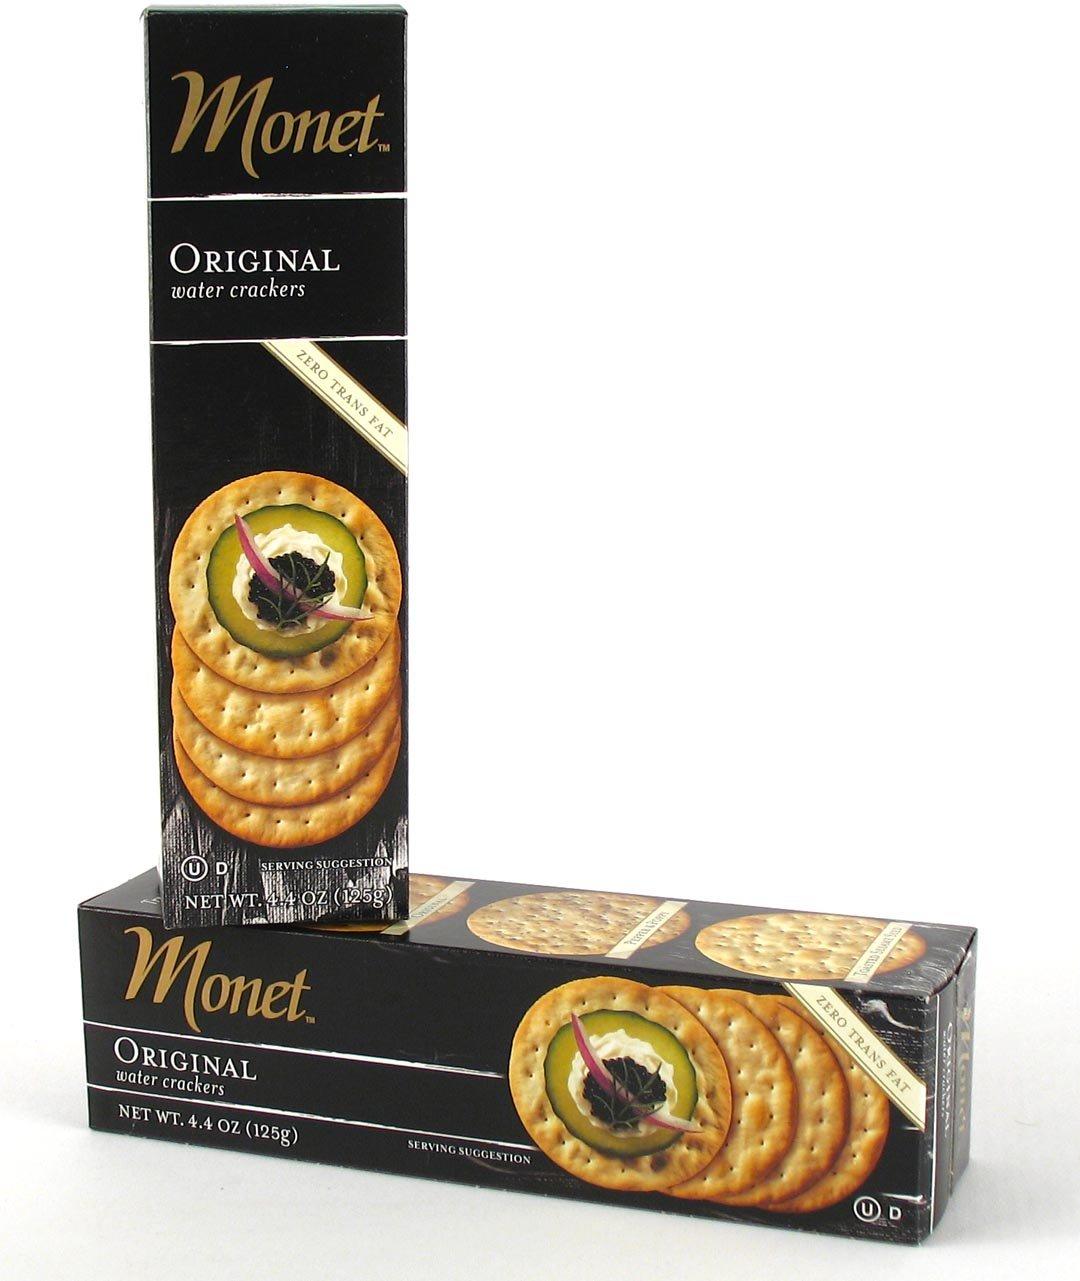 Monet Water Crackers, Original, 4.4 oz